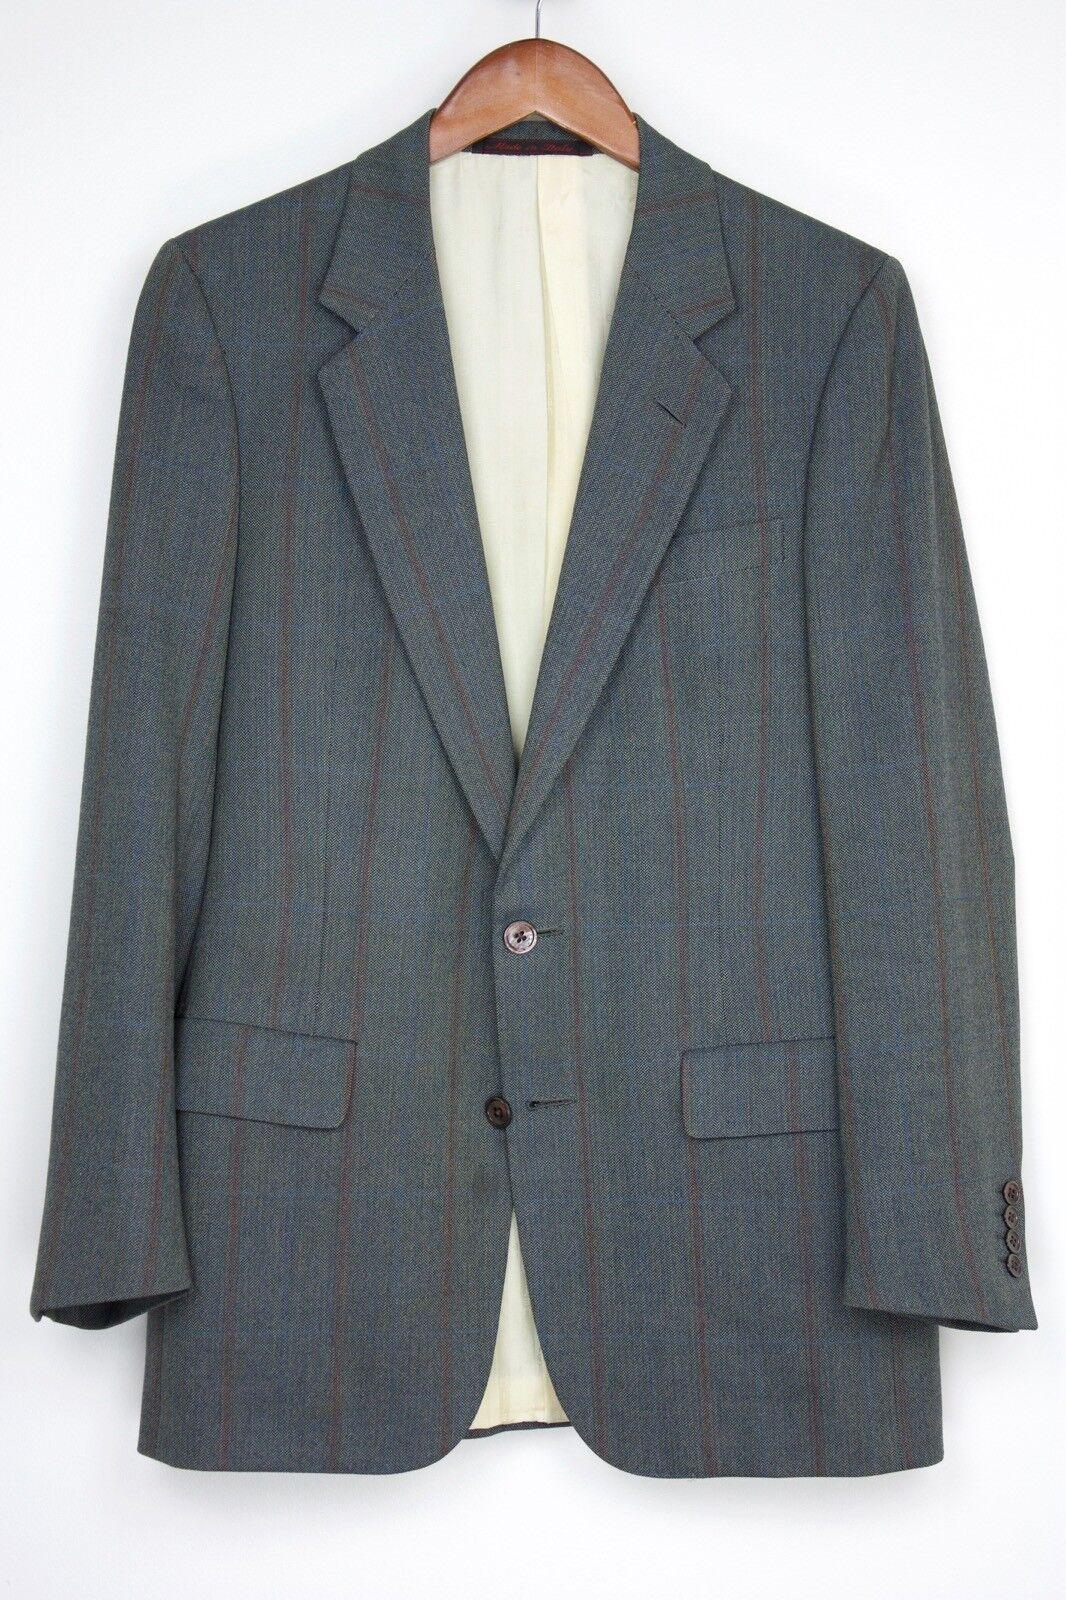 Bijan D'Avenza Wool Suit 38R 34x29 Braun/grau Herringbone Blau ROT Coat Pants